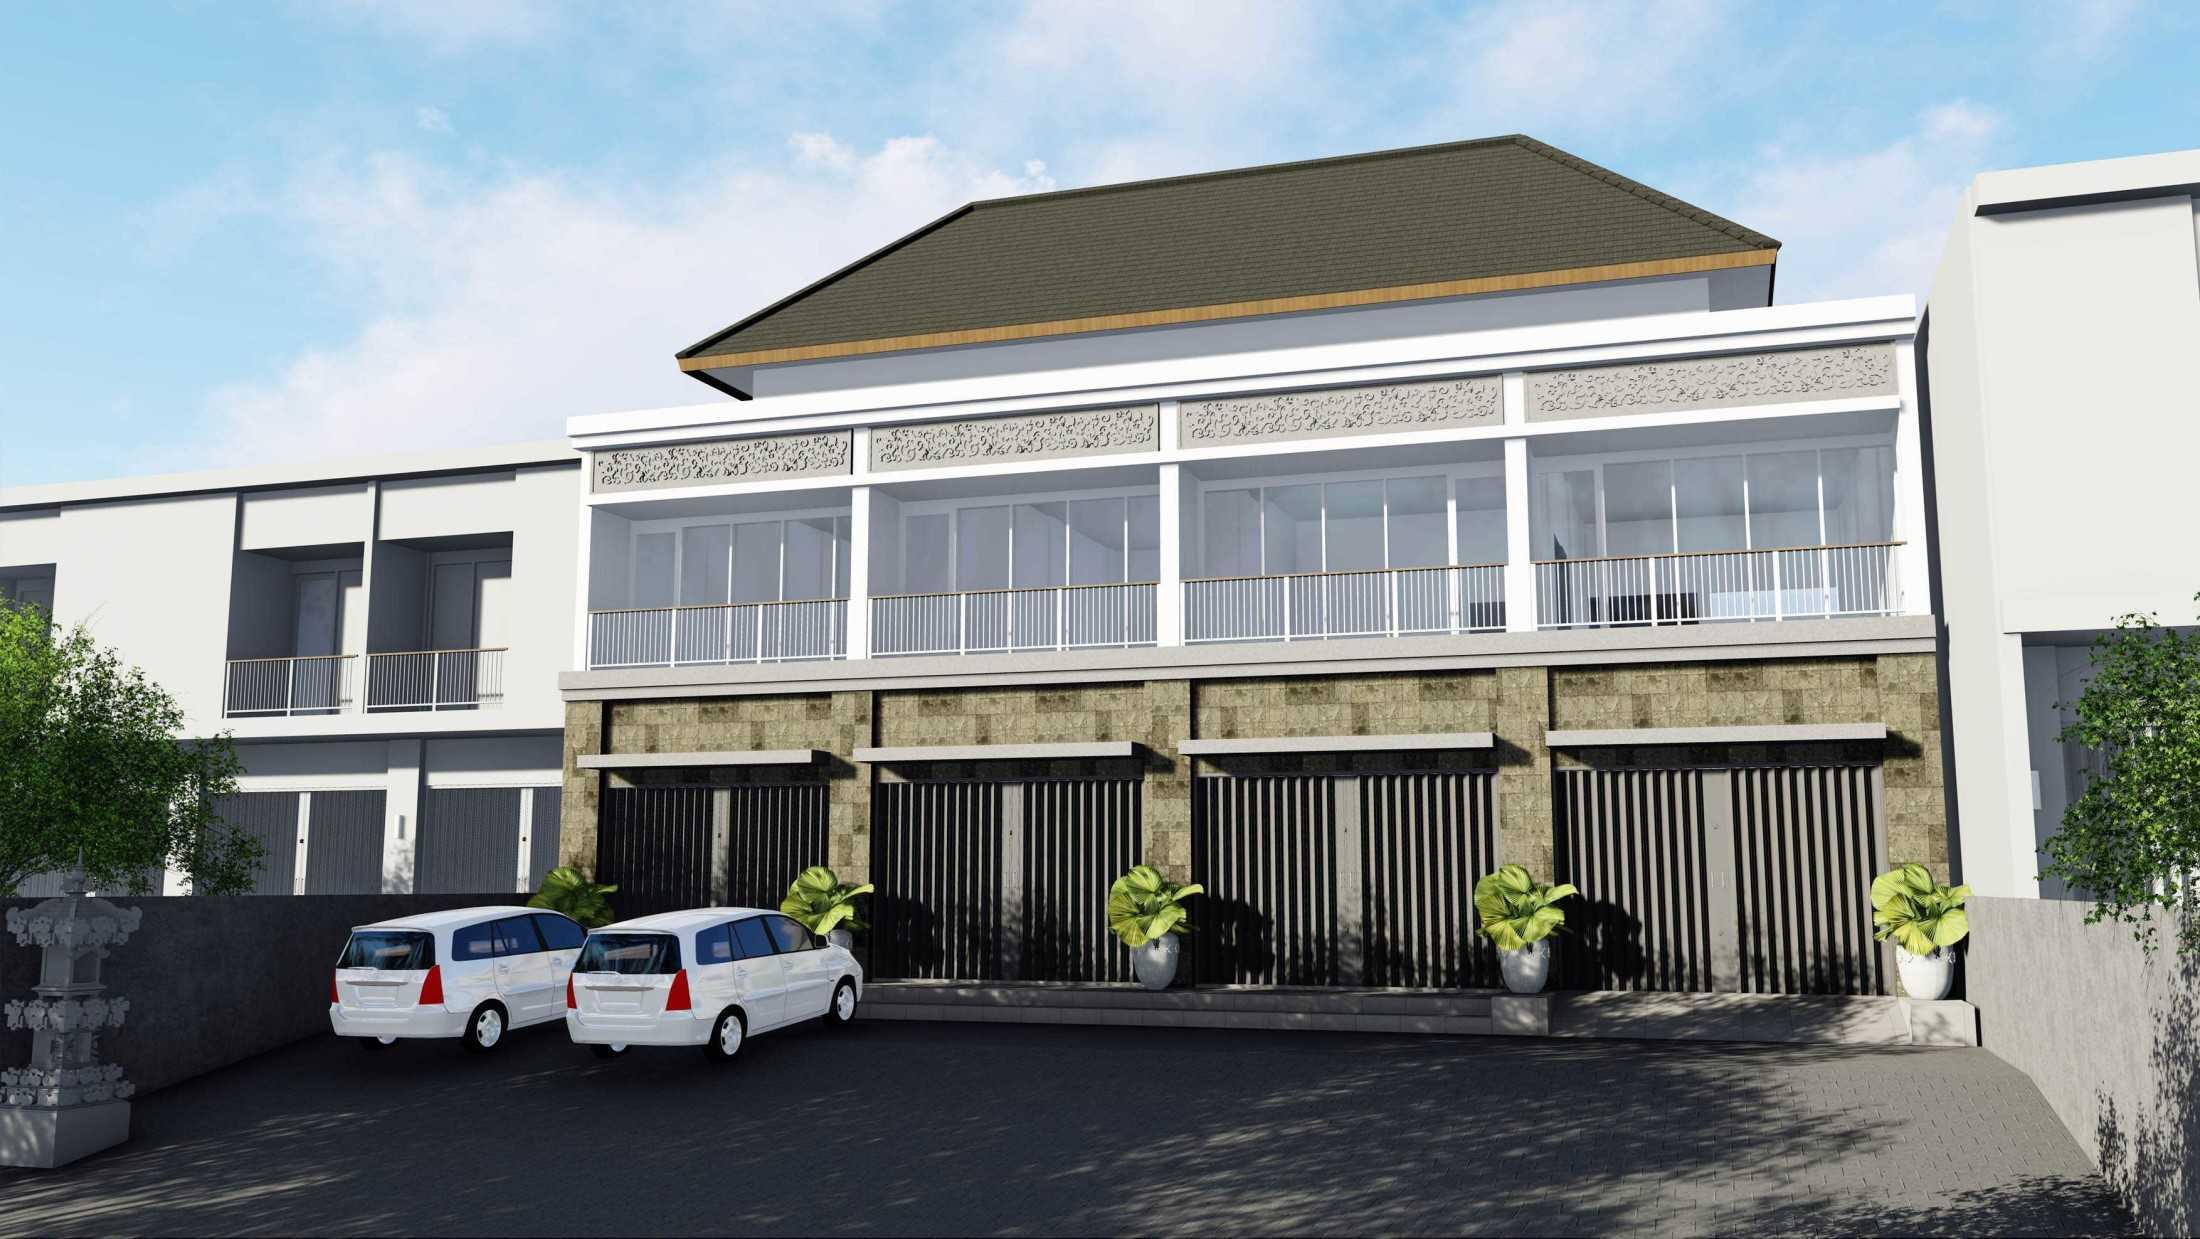 Revan Teggar Shop House & Room Apartment Kota Denpasar, Bali, Indonesia Kota Denpasar, Bali, Indonesia Revan-Teggar-Shop-House-Room-Apartment  124035